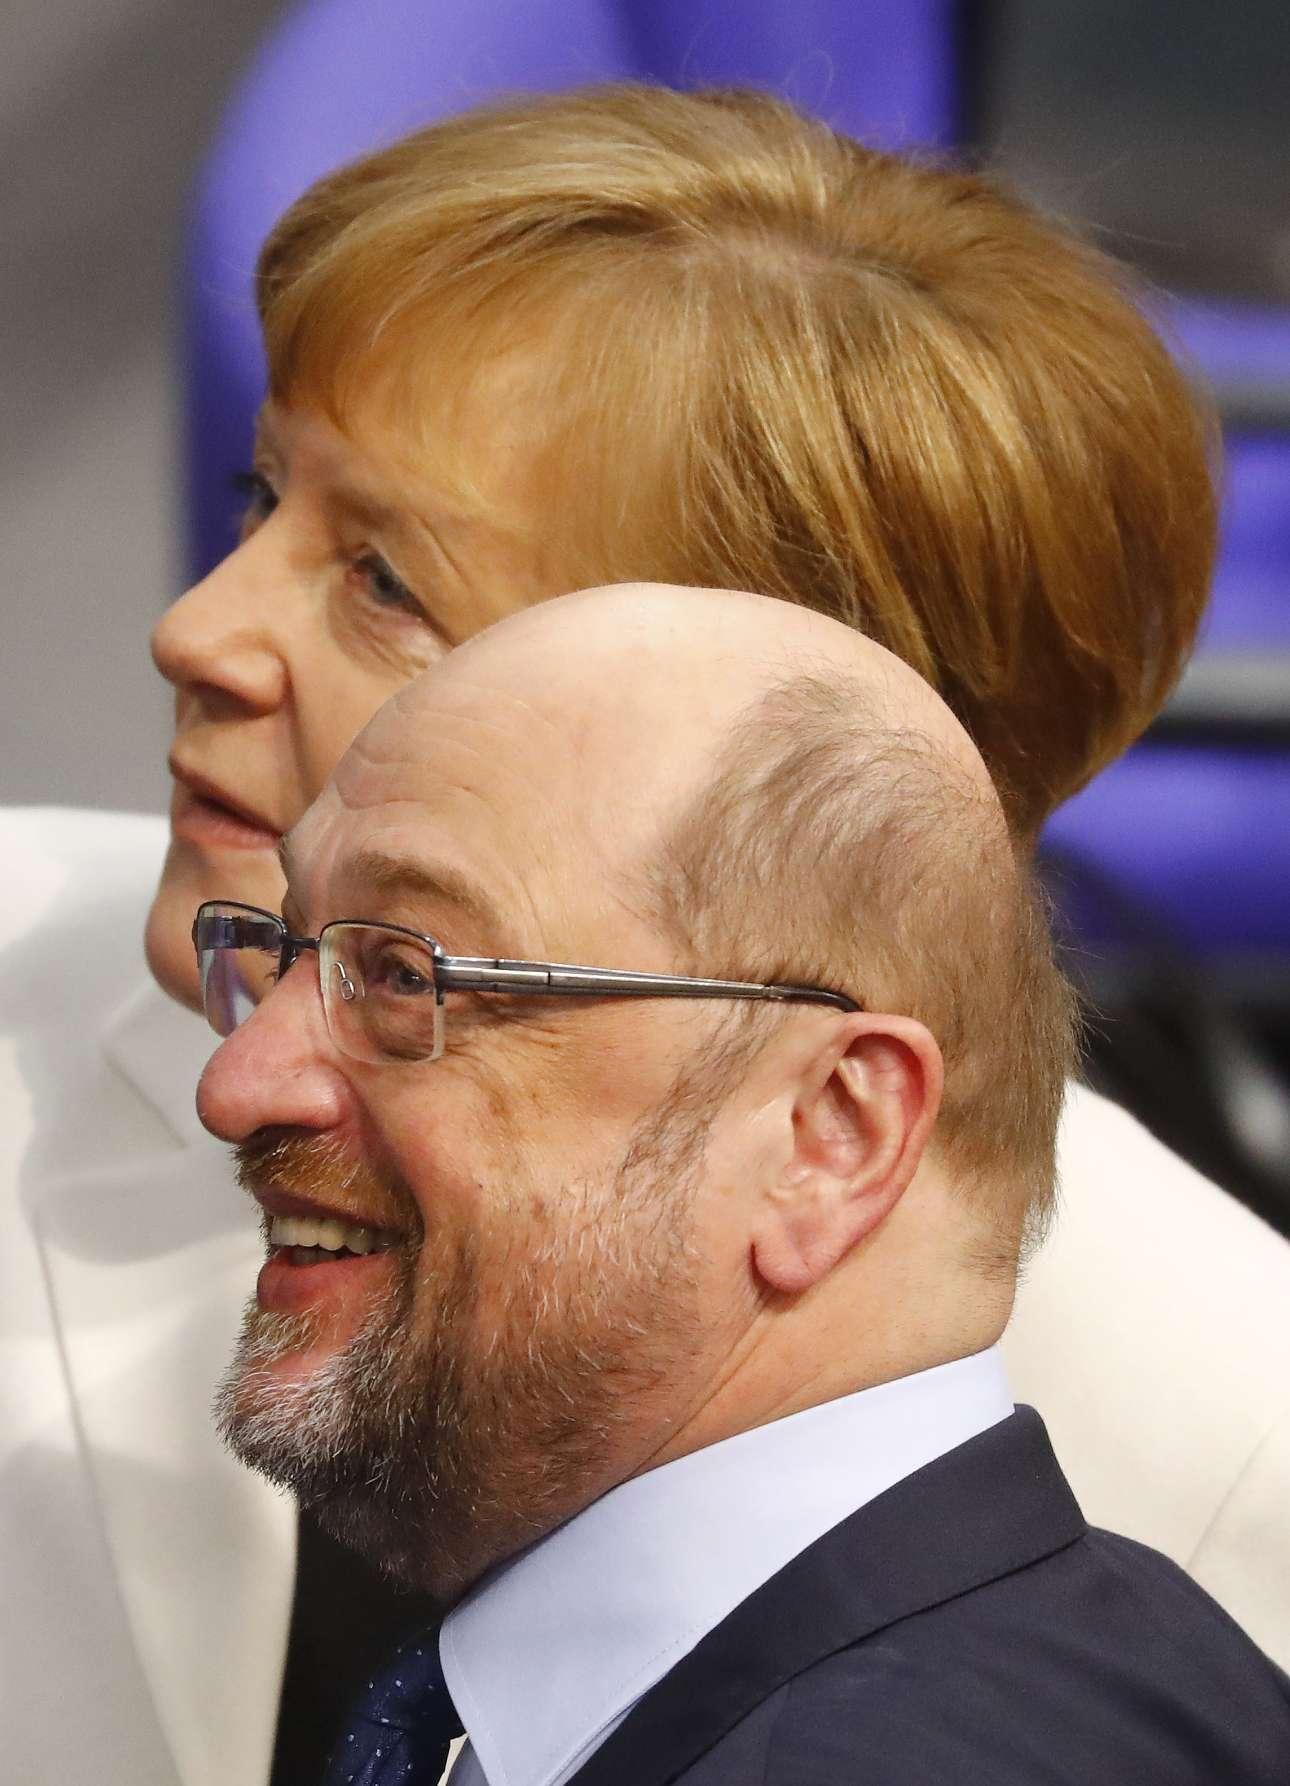 2018-03-14T083140Z_189210344_UP1EE3E0NOSIX_RTRMADP_3_GERMANY-POLITICS